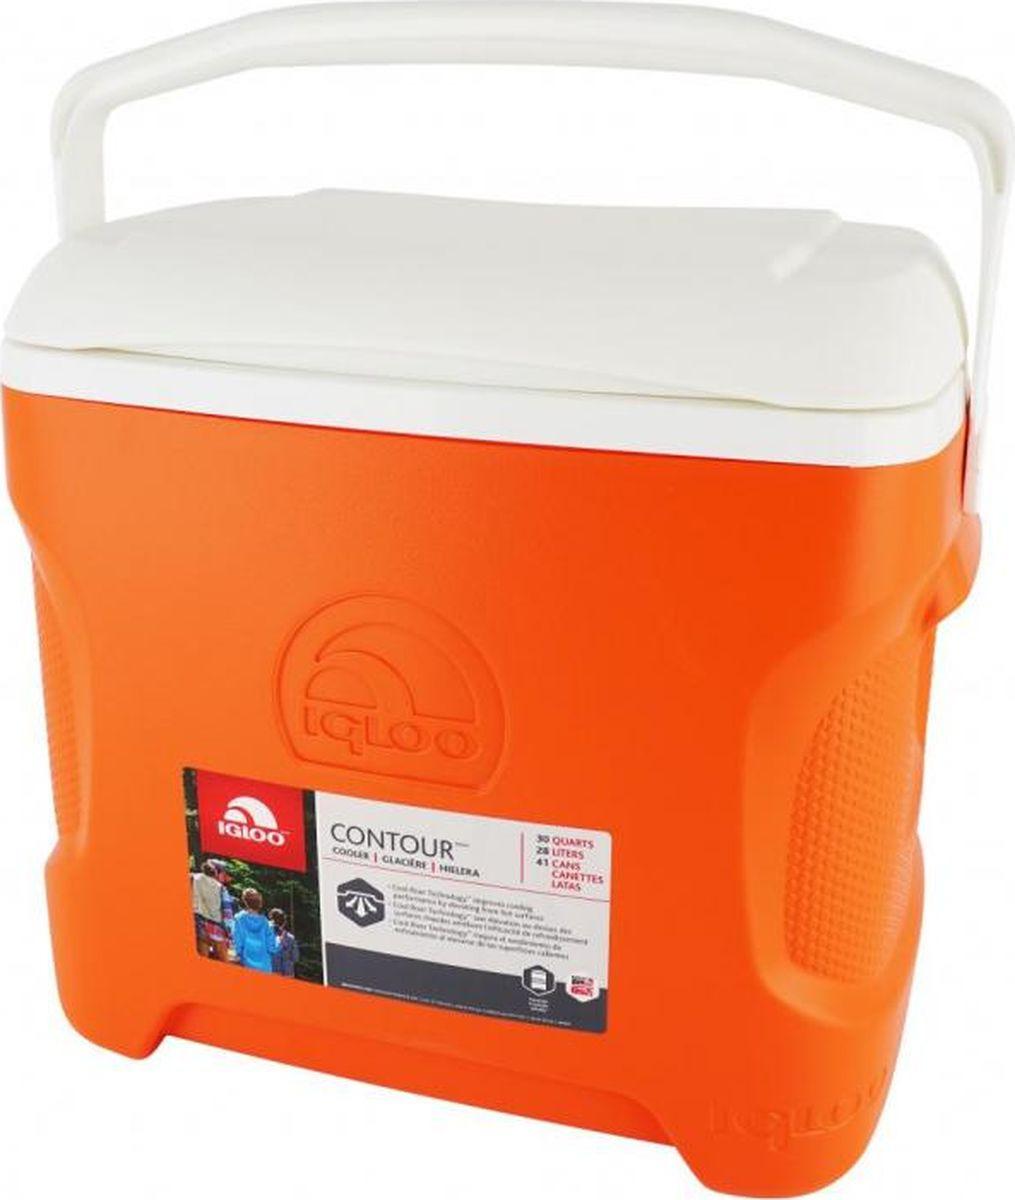 Изотермический контейнер Igloo Contour, 00049106, оранжевый, 47 х 34 х 43 см igloo изотермический контейнер igloo playmate pal jucetwh